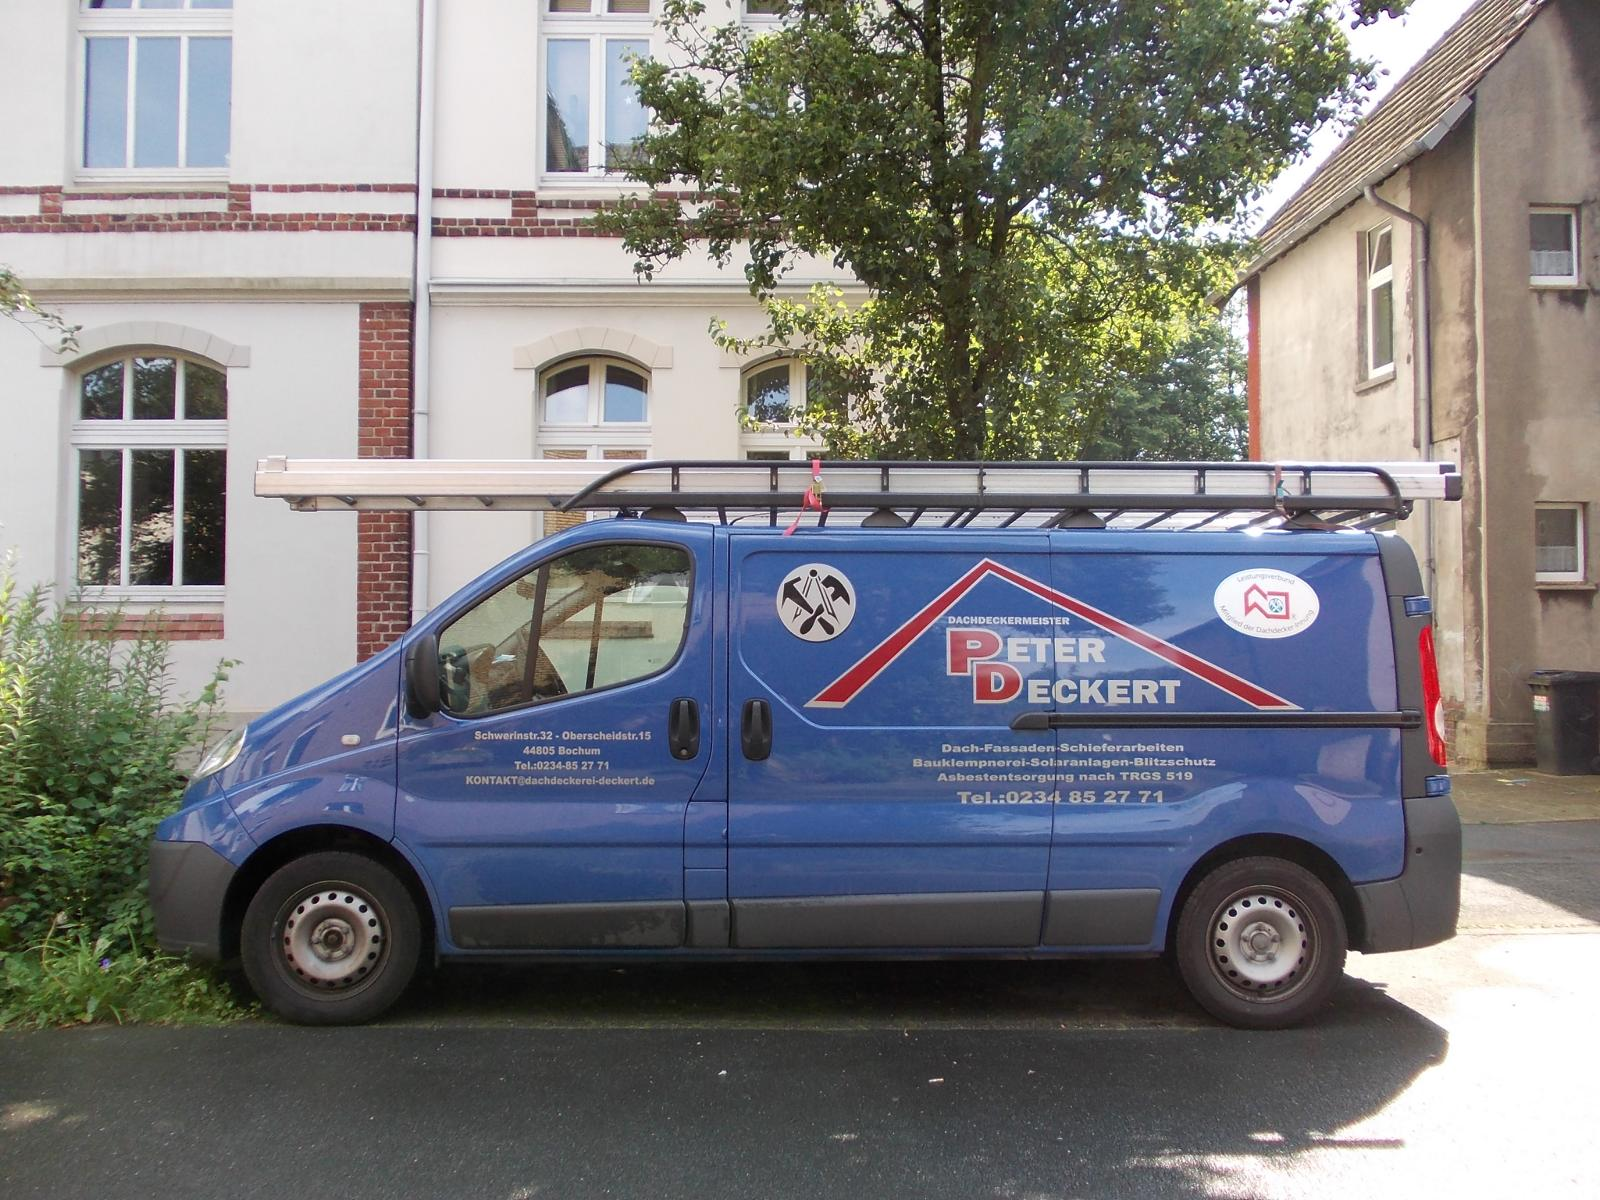 firmenfahrzeug dachdecker, firmenfahrzeug dachdeckerei deckert aus bochum, blaues firmenfahrzeug pet